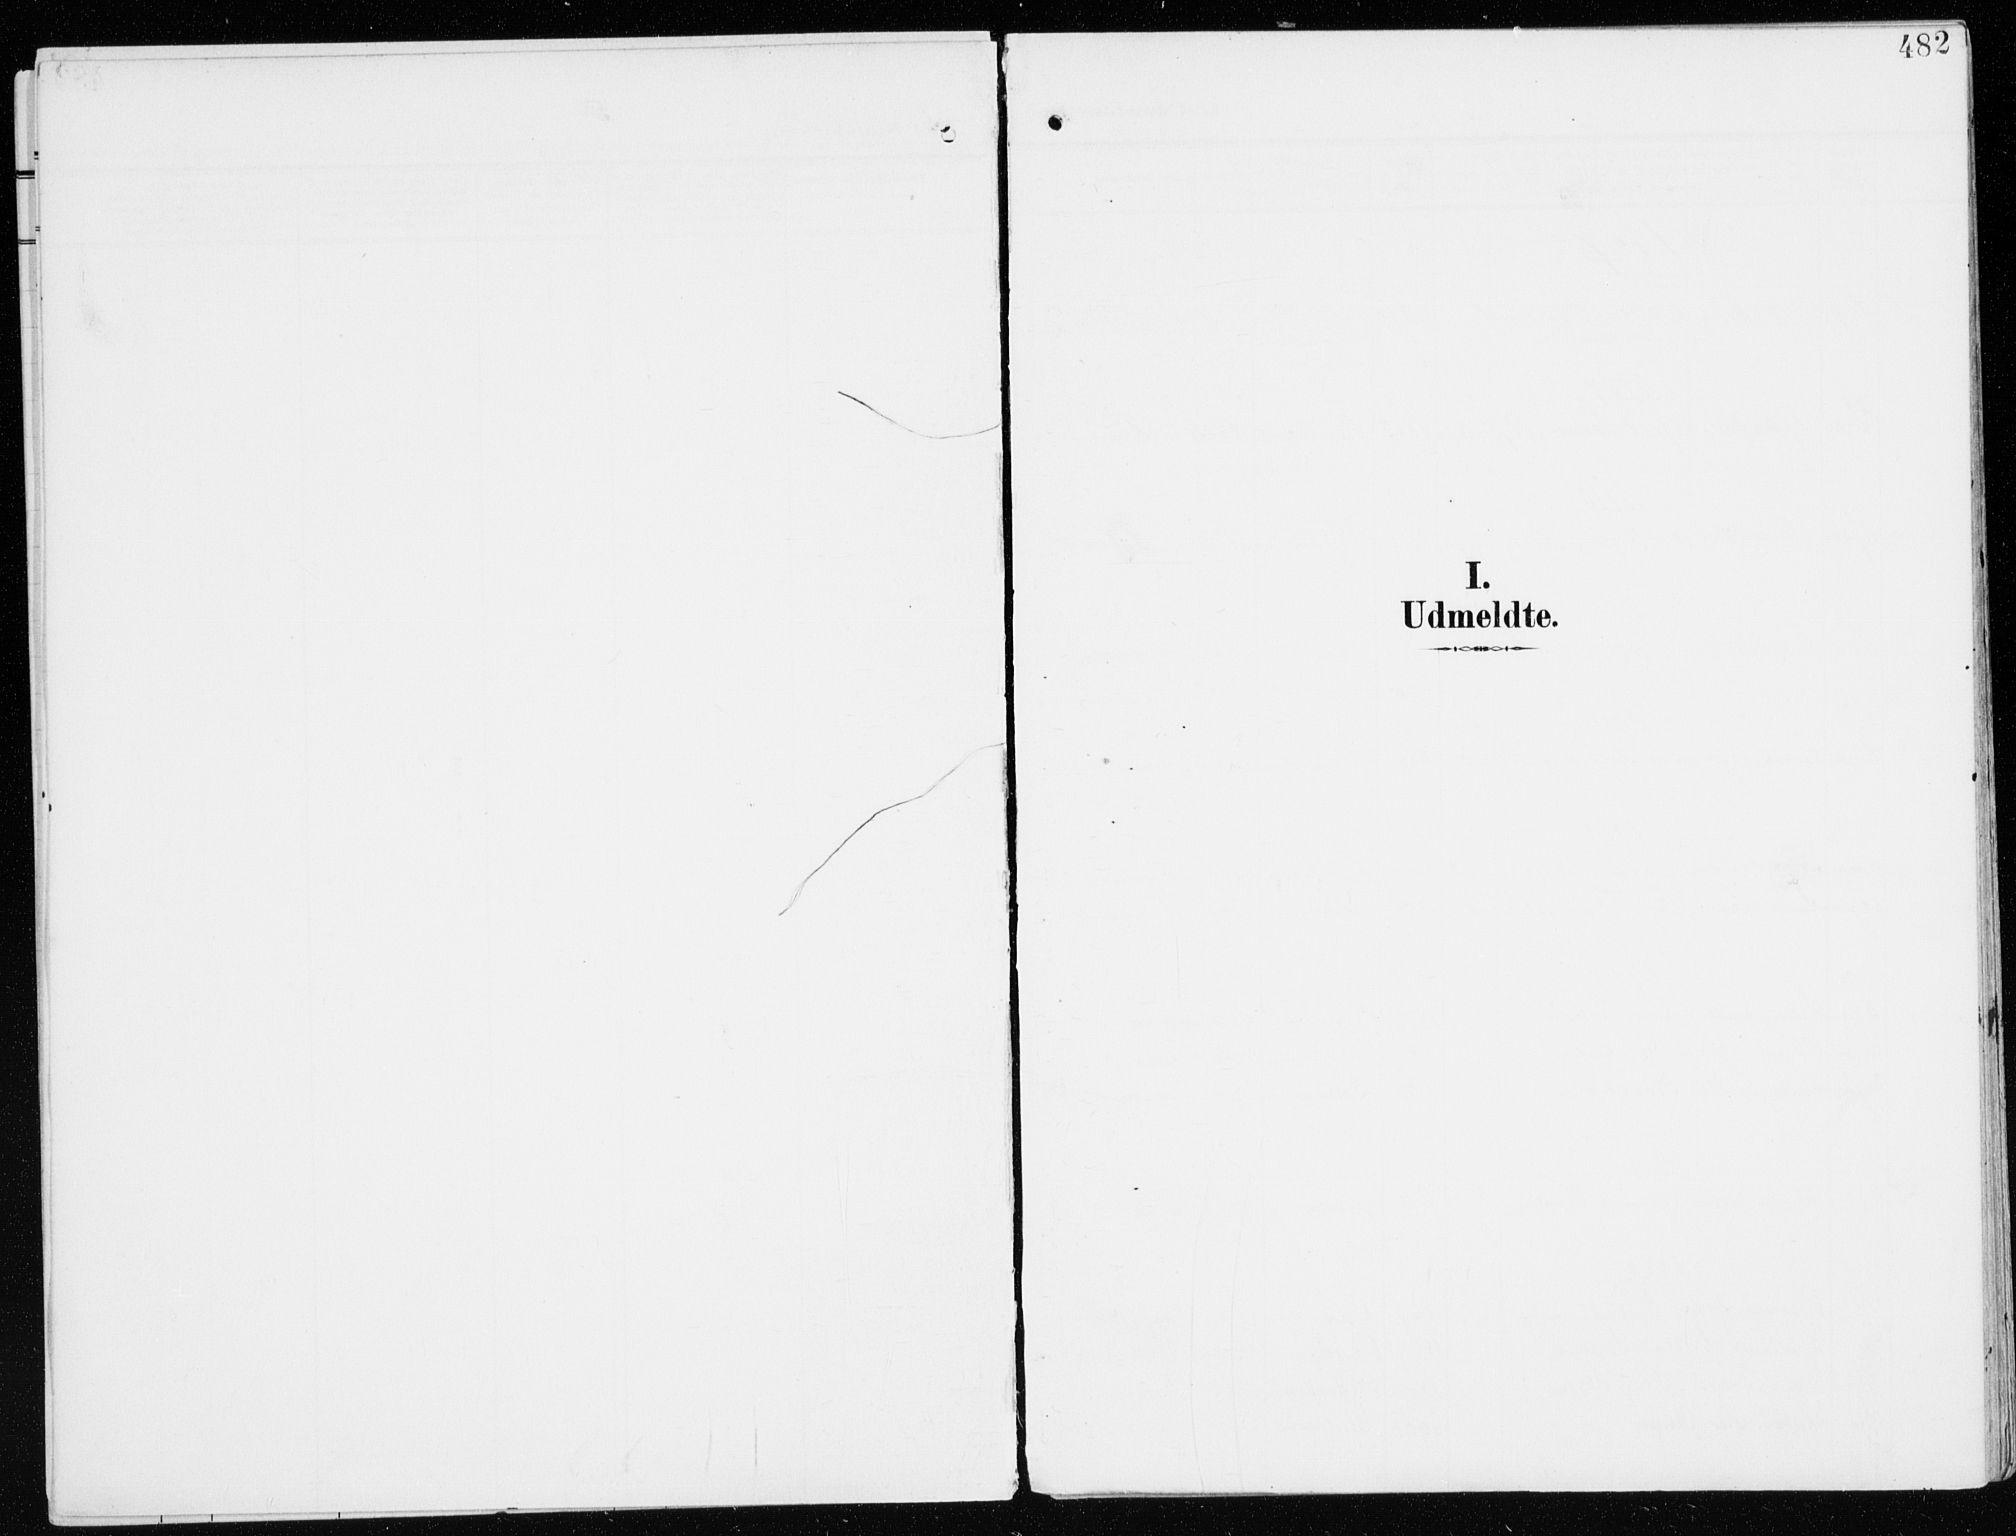 SAH, Furnes prestekontor, K/Ka/L0001: Ministerialbok nr. 1, 1907-1935, s. 482